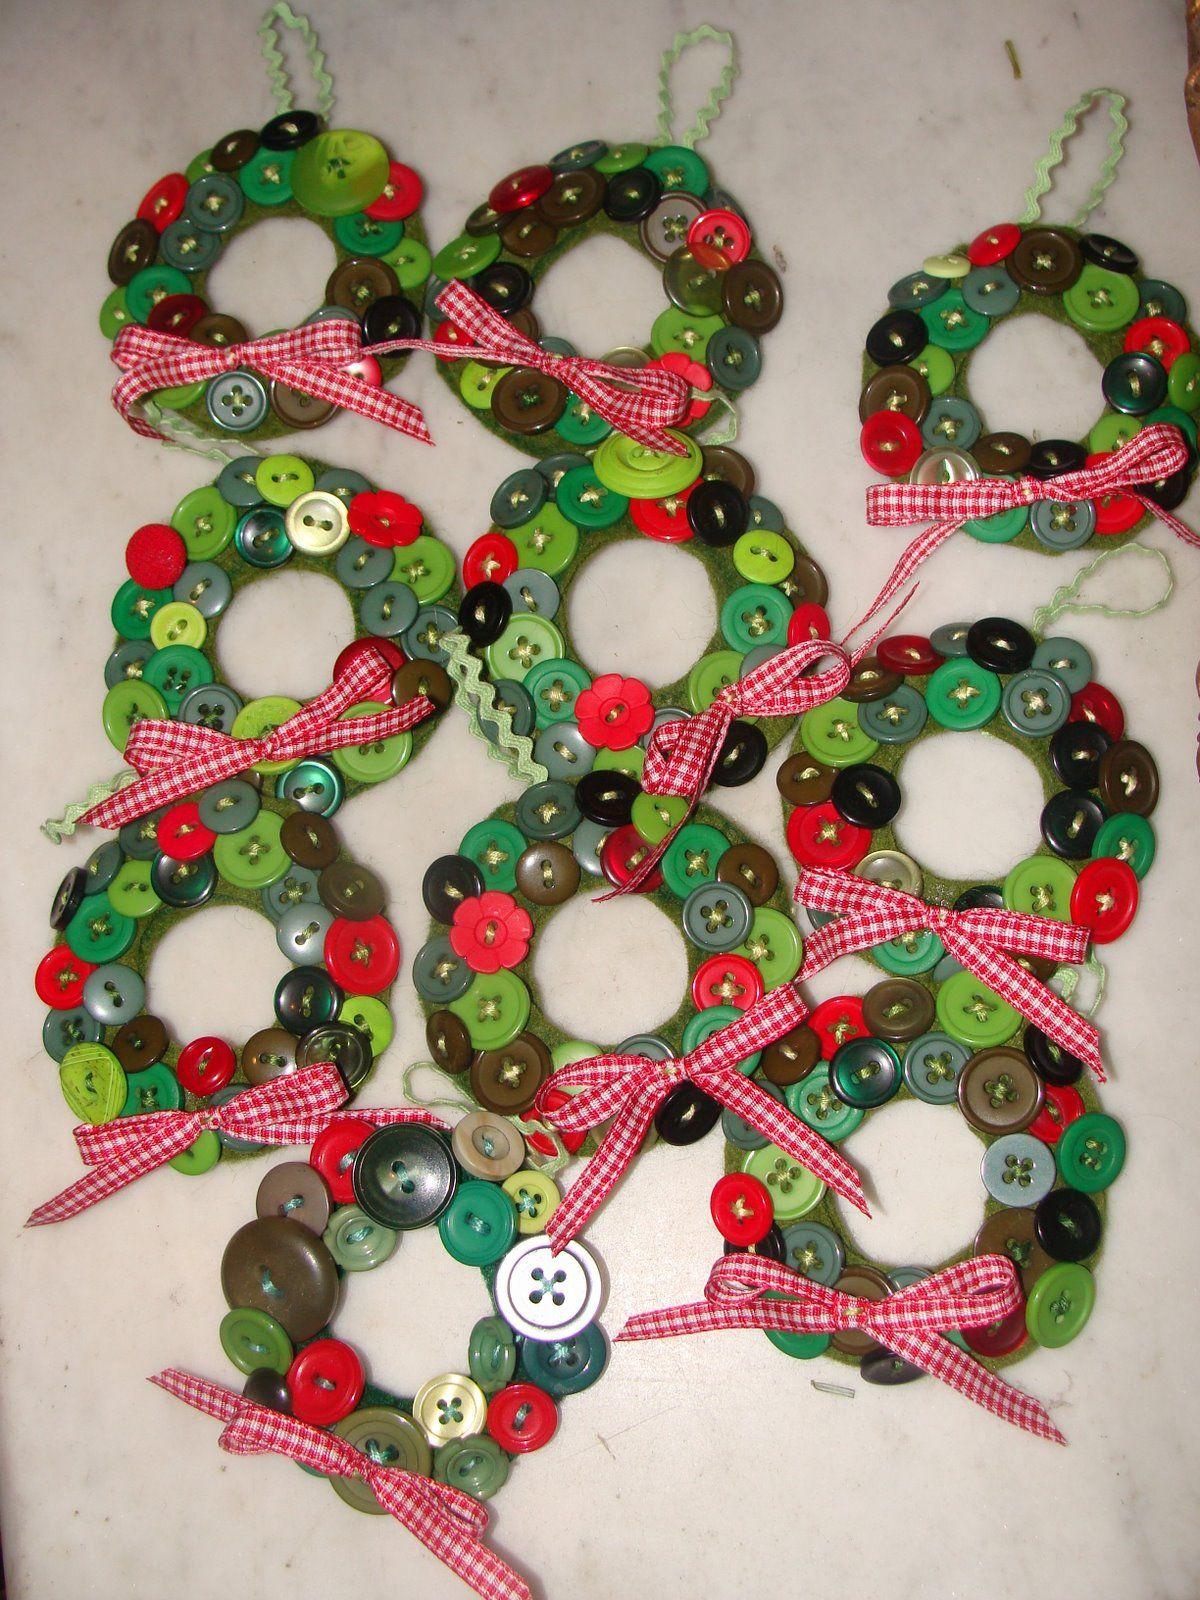 Gingham Ricrac December 2008 Christmas Crafts Xmas Crafts Ornaments Diy Kids